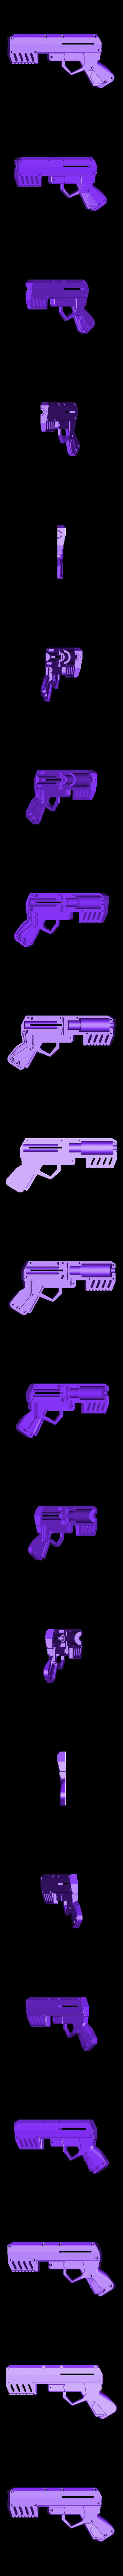 shell1.stl Download free STL file Foam Dart GUN (pullback loading) • 3D print design, senns